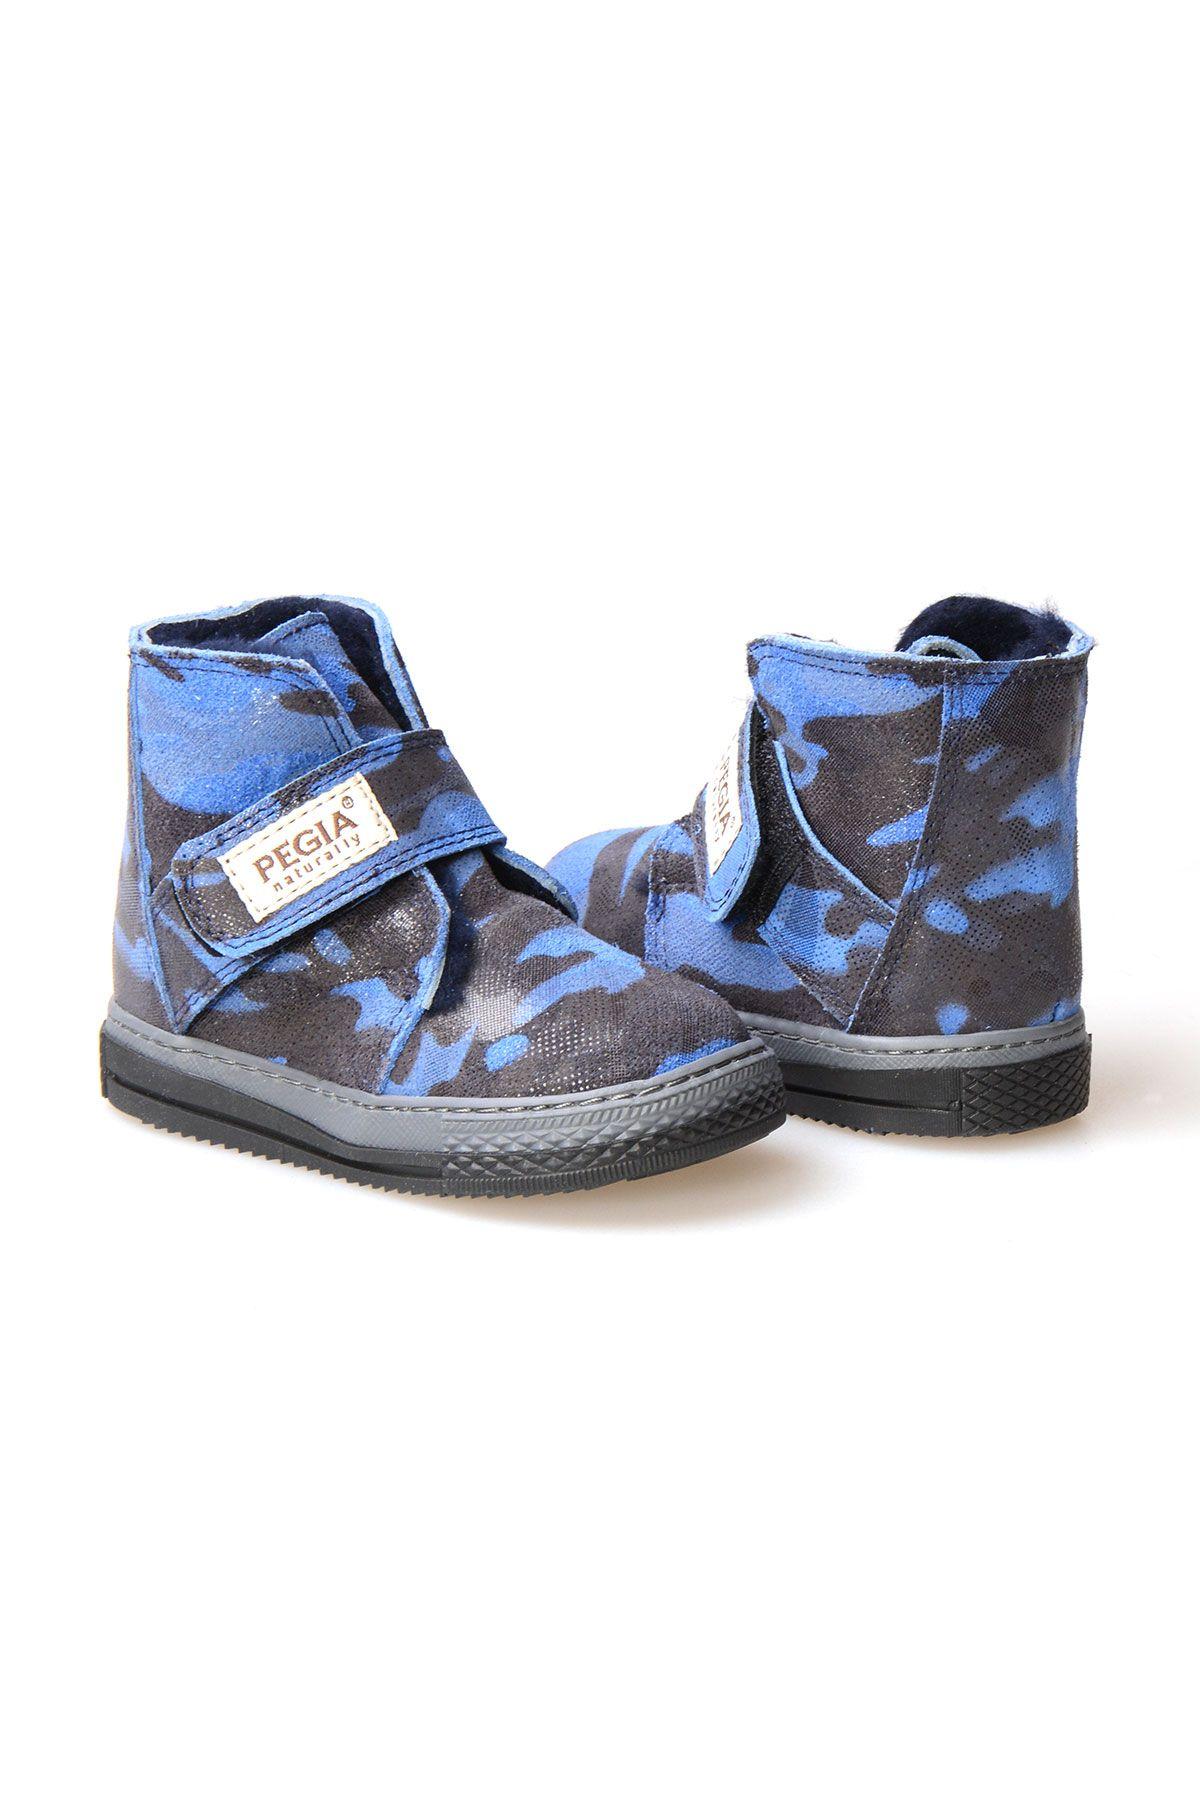 Pegia Genuine Suede Sheepskin Lined Kid's Boots 186010 Indigo-blue